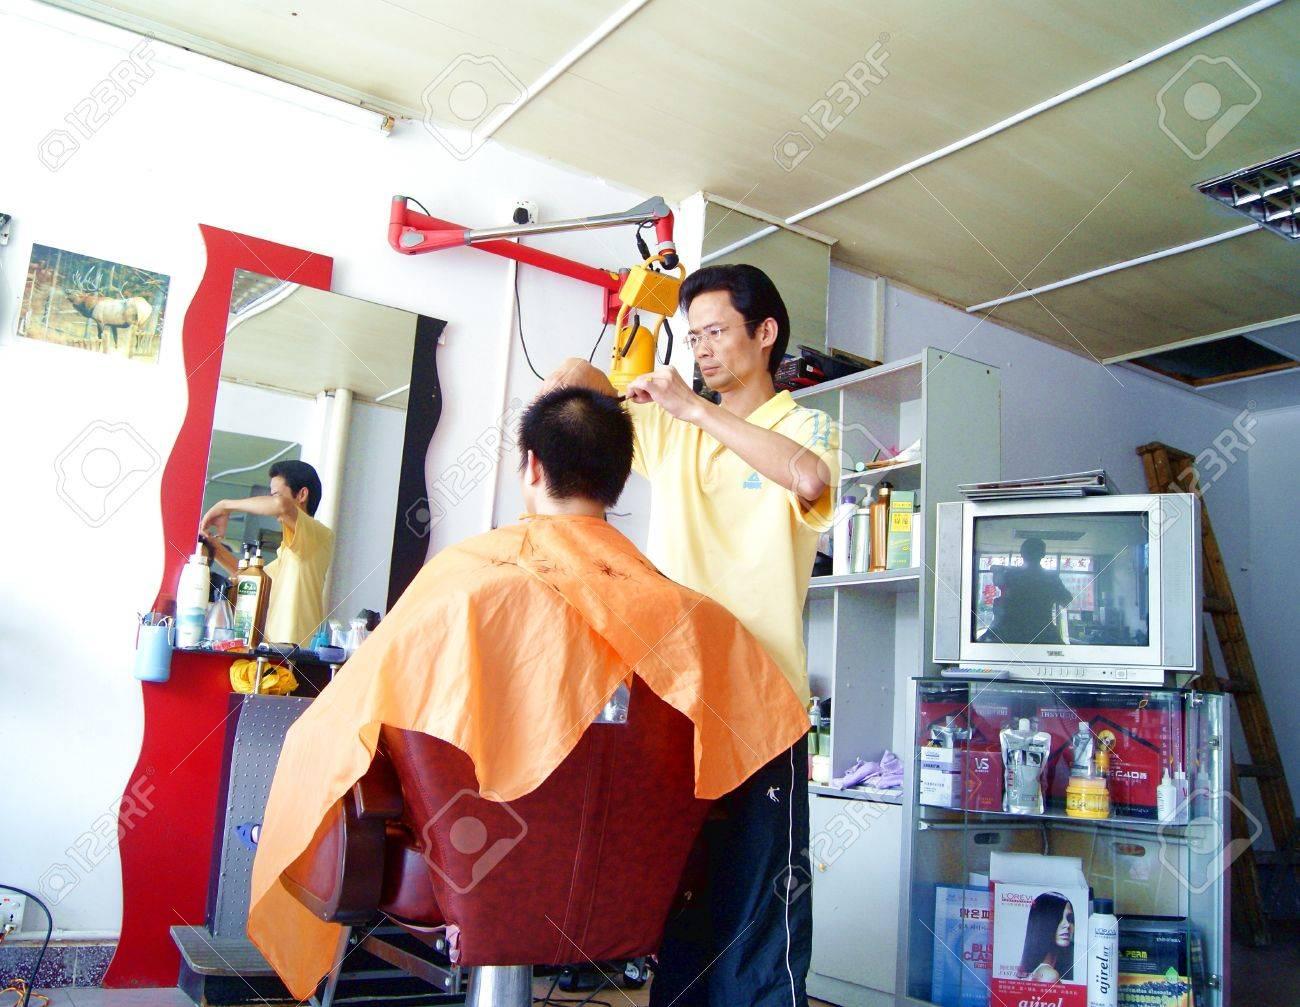 haircut  Stock Photo - 14423502